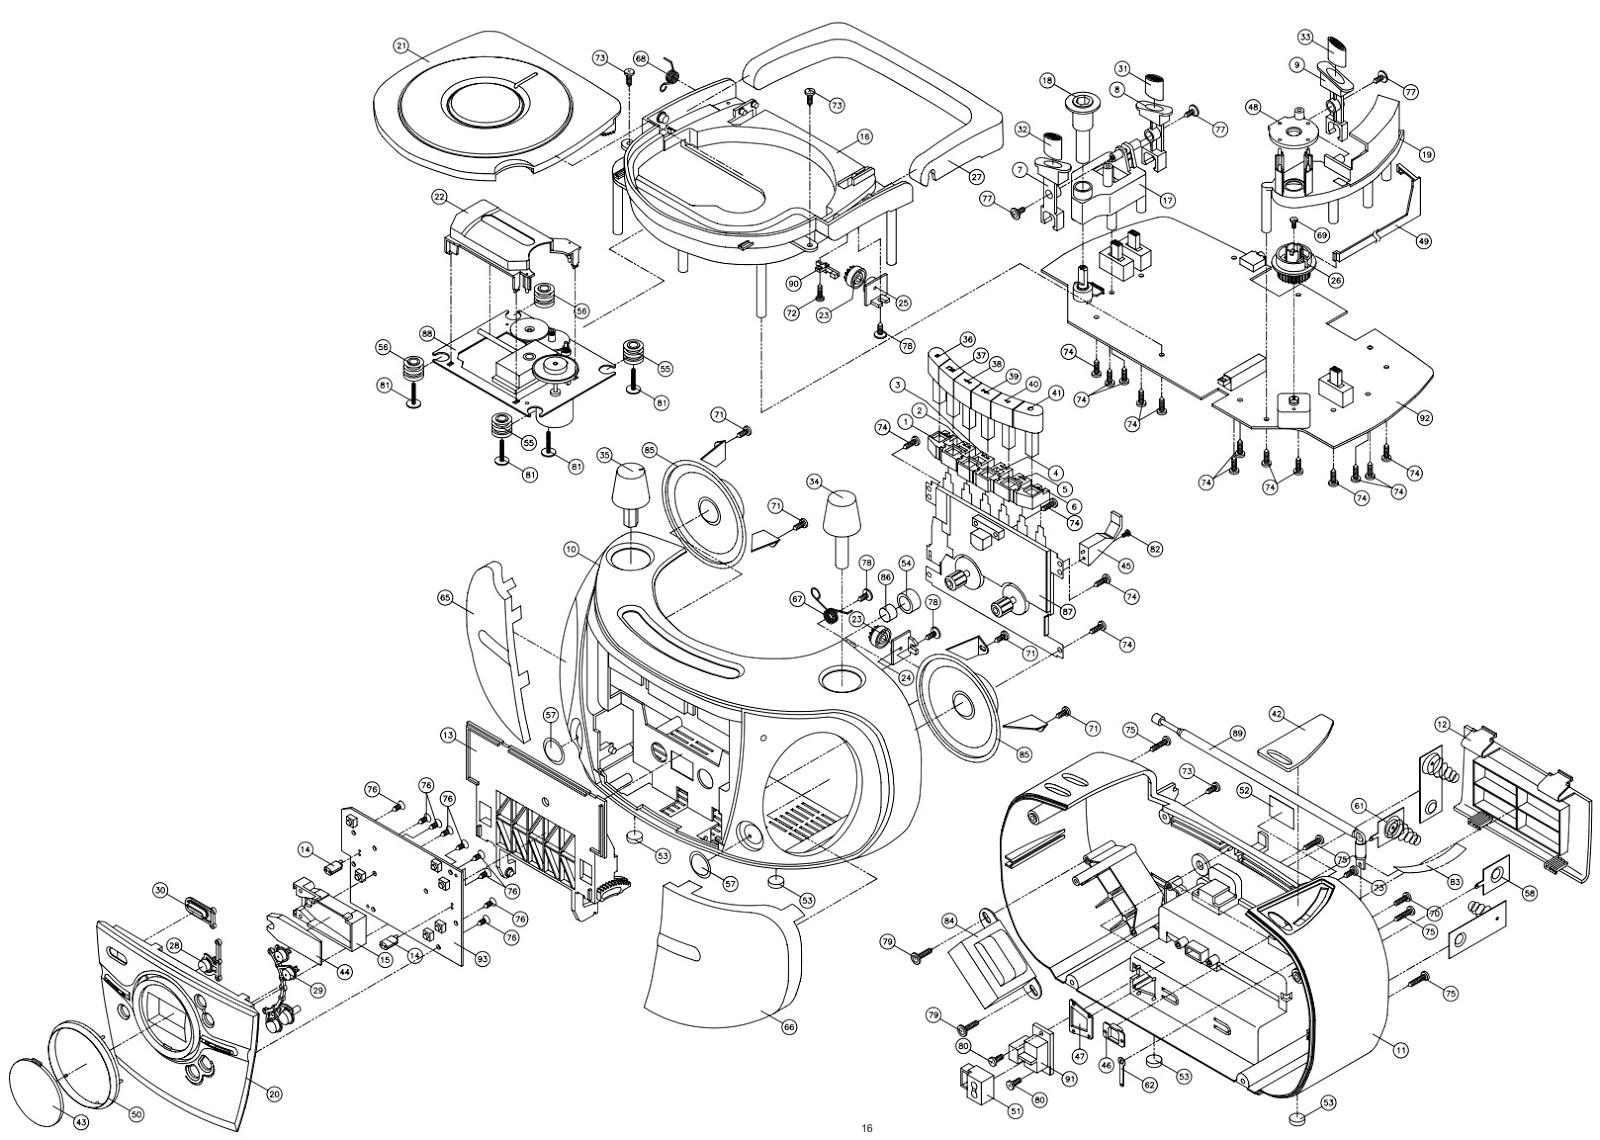 Silva Schneider Pcd136 Circuit Diagram Portable Mw Fm Radio With Cassette Recorder